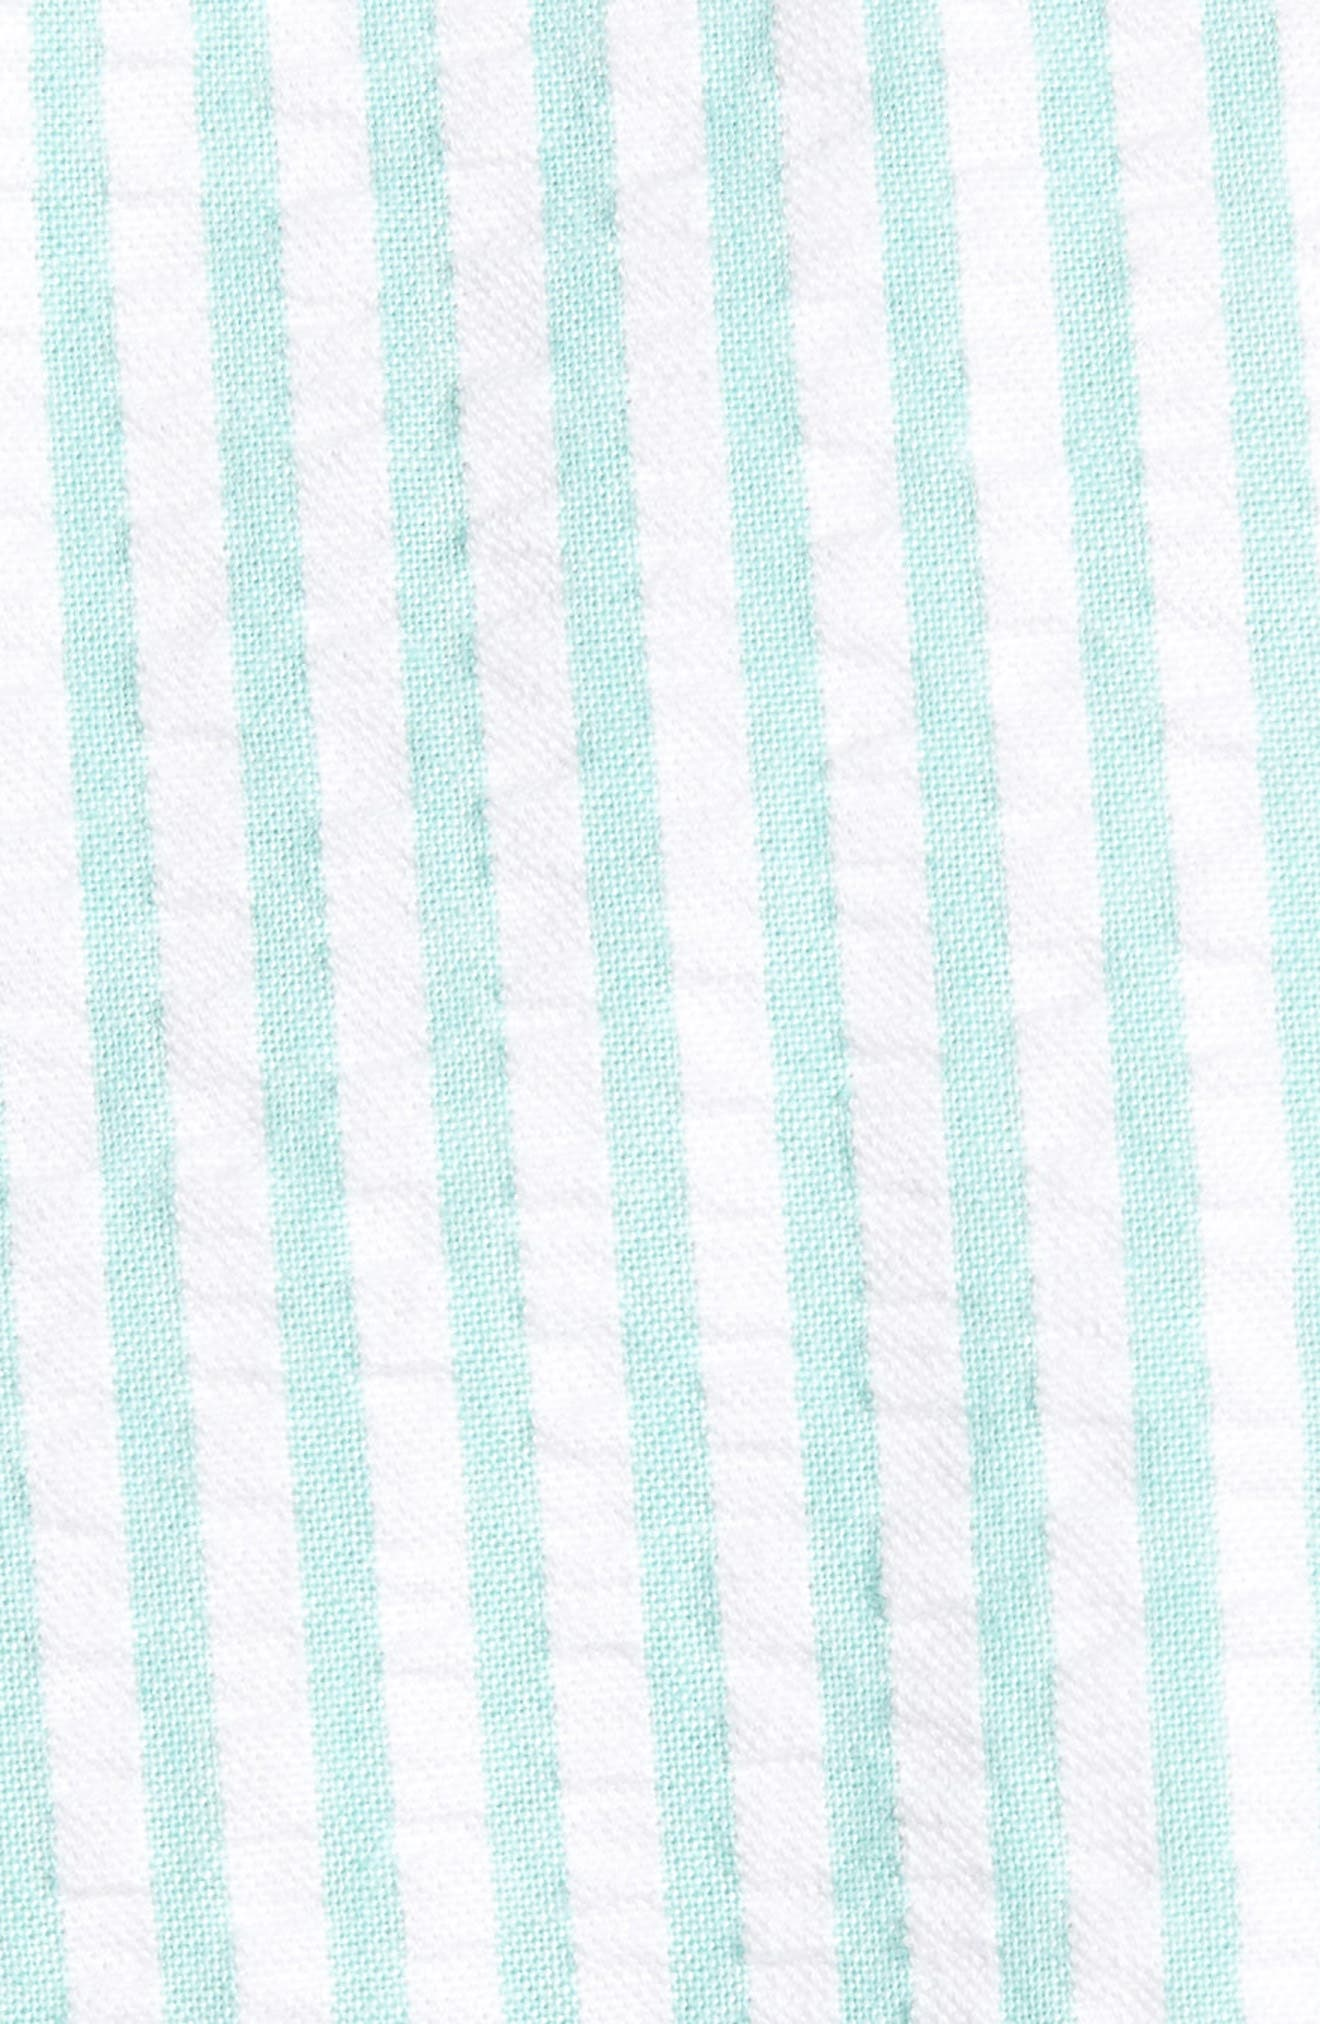 Trim Fit Seersucker Short Sleeve Sport Shirt,                             Alternate thumbnail 5, color,                             White Green Seersucker Stripe